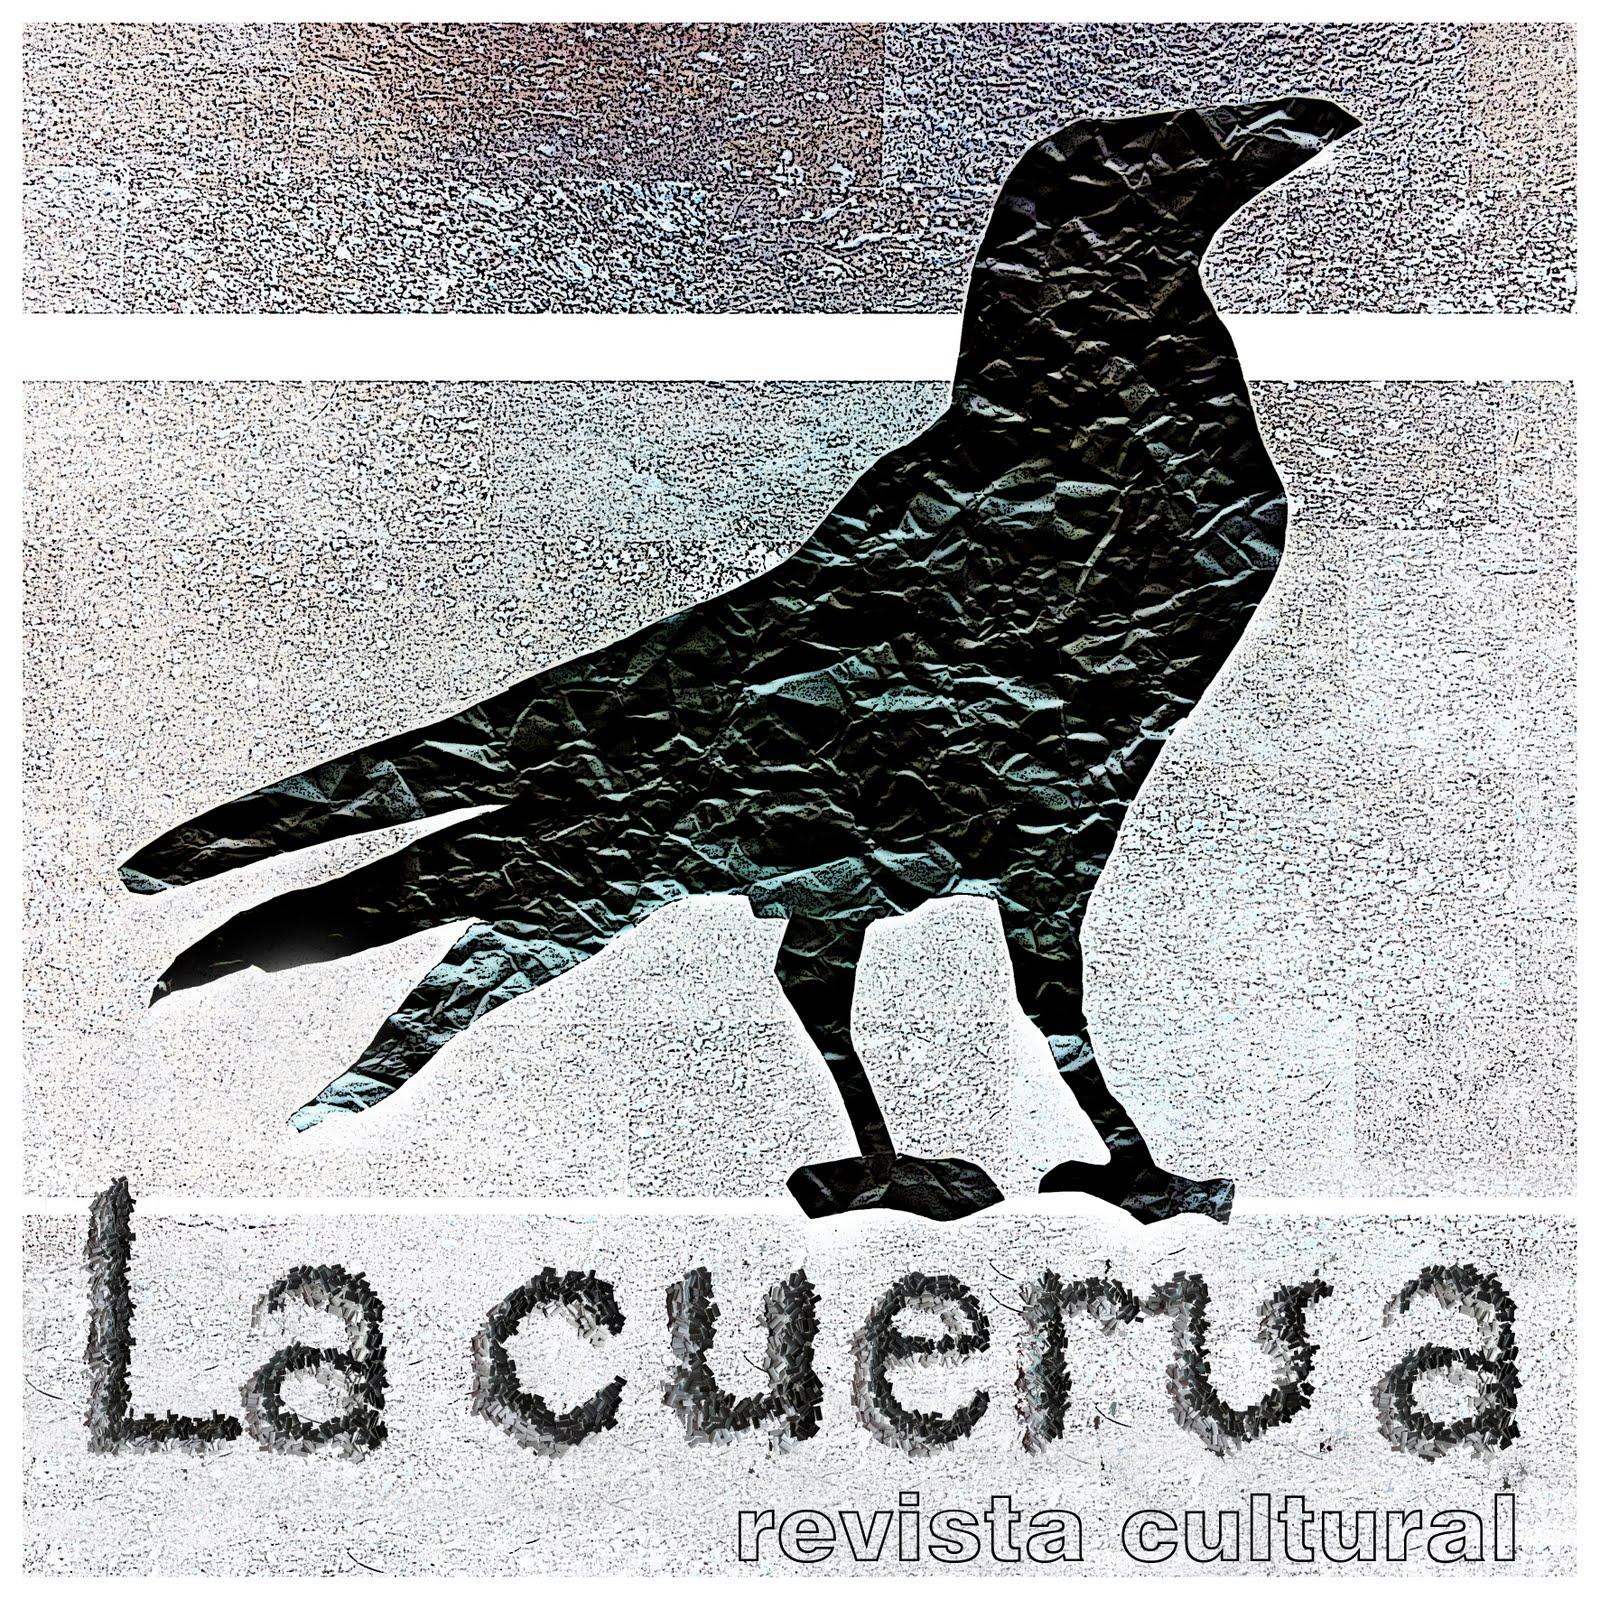 revista La Cuerva